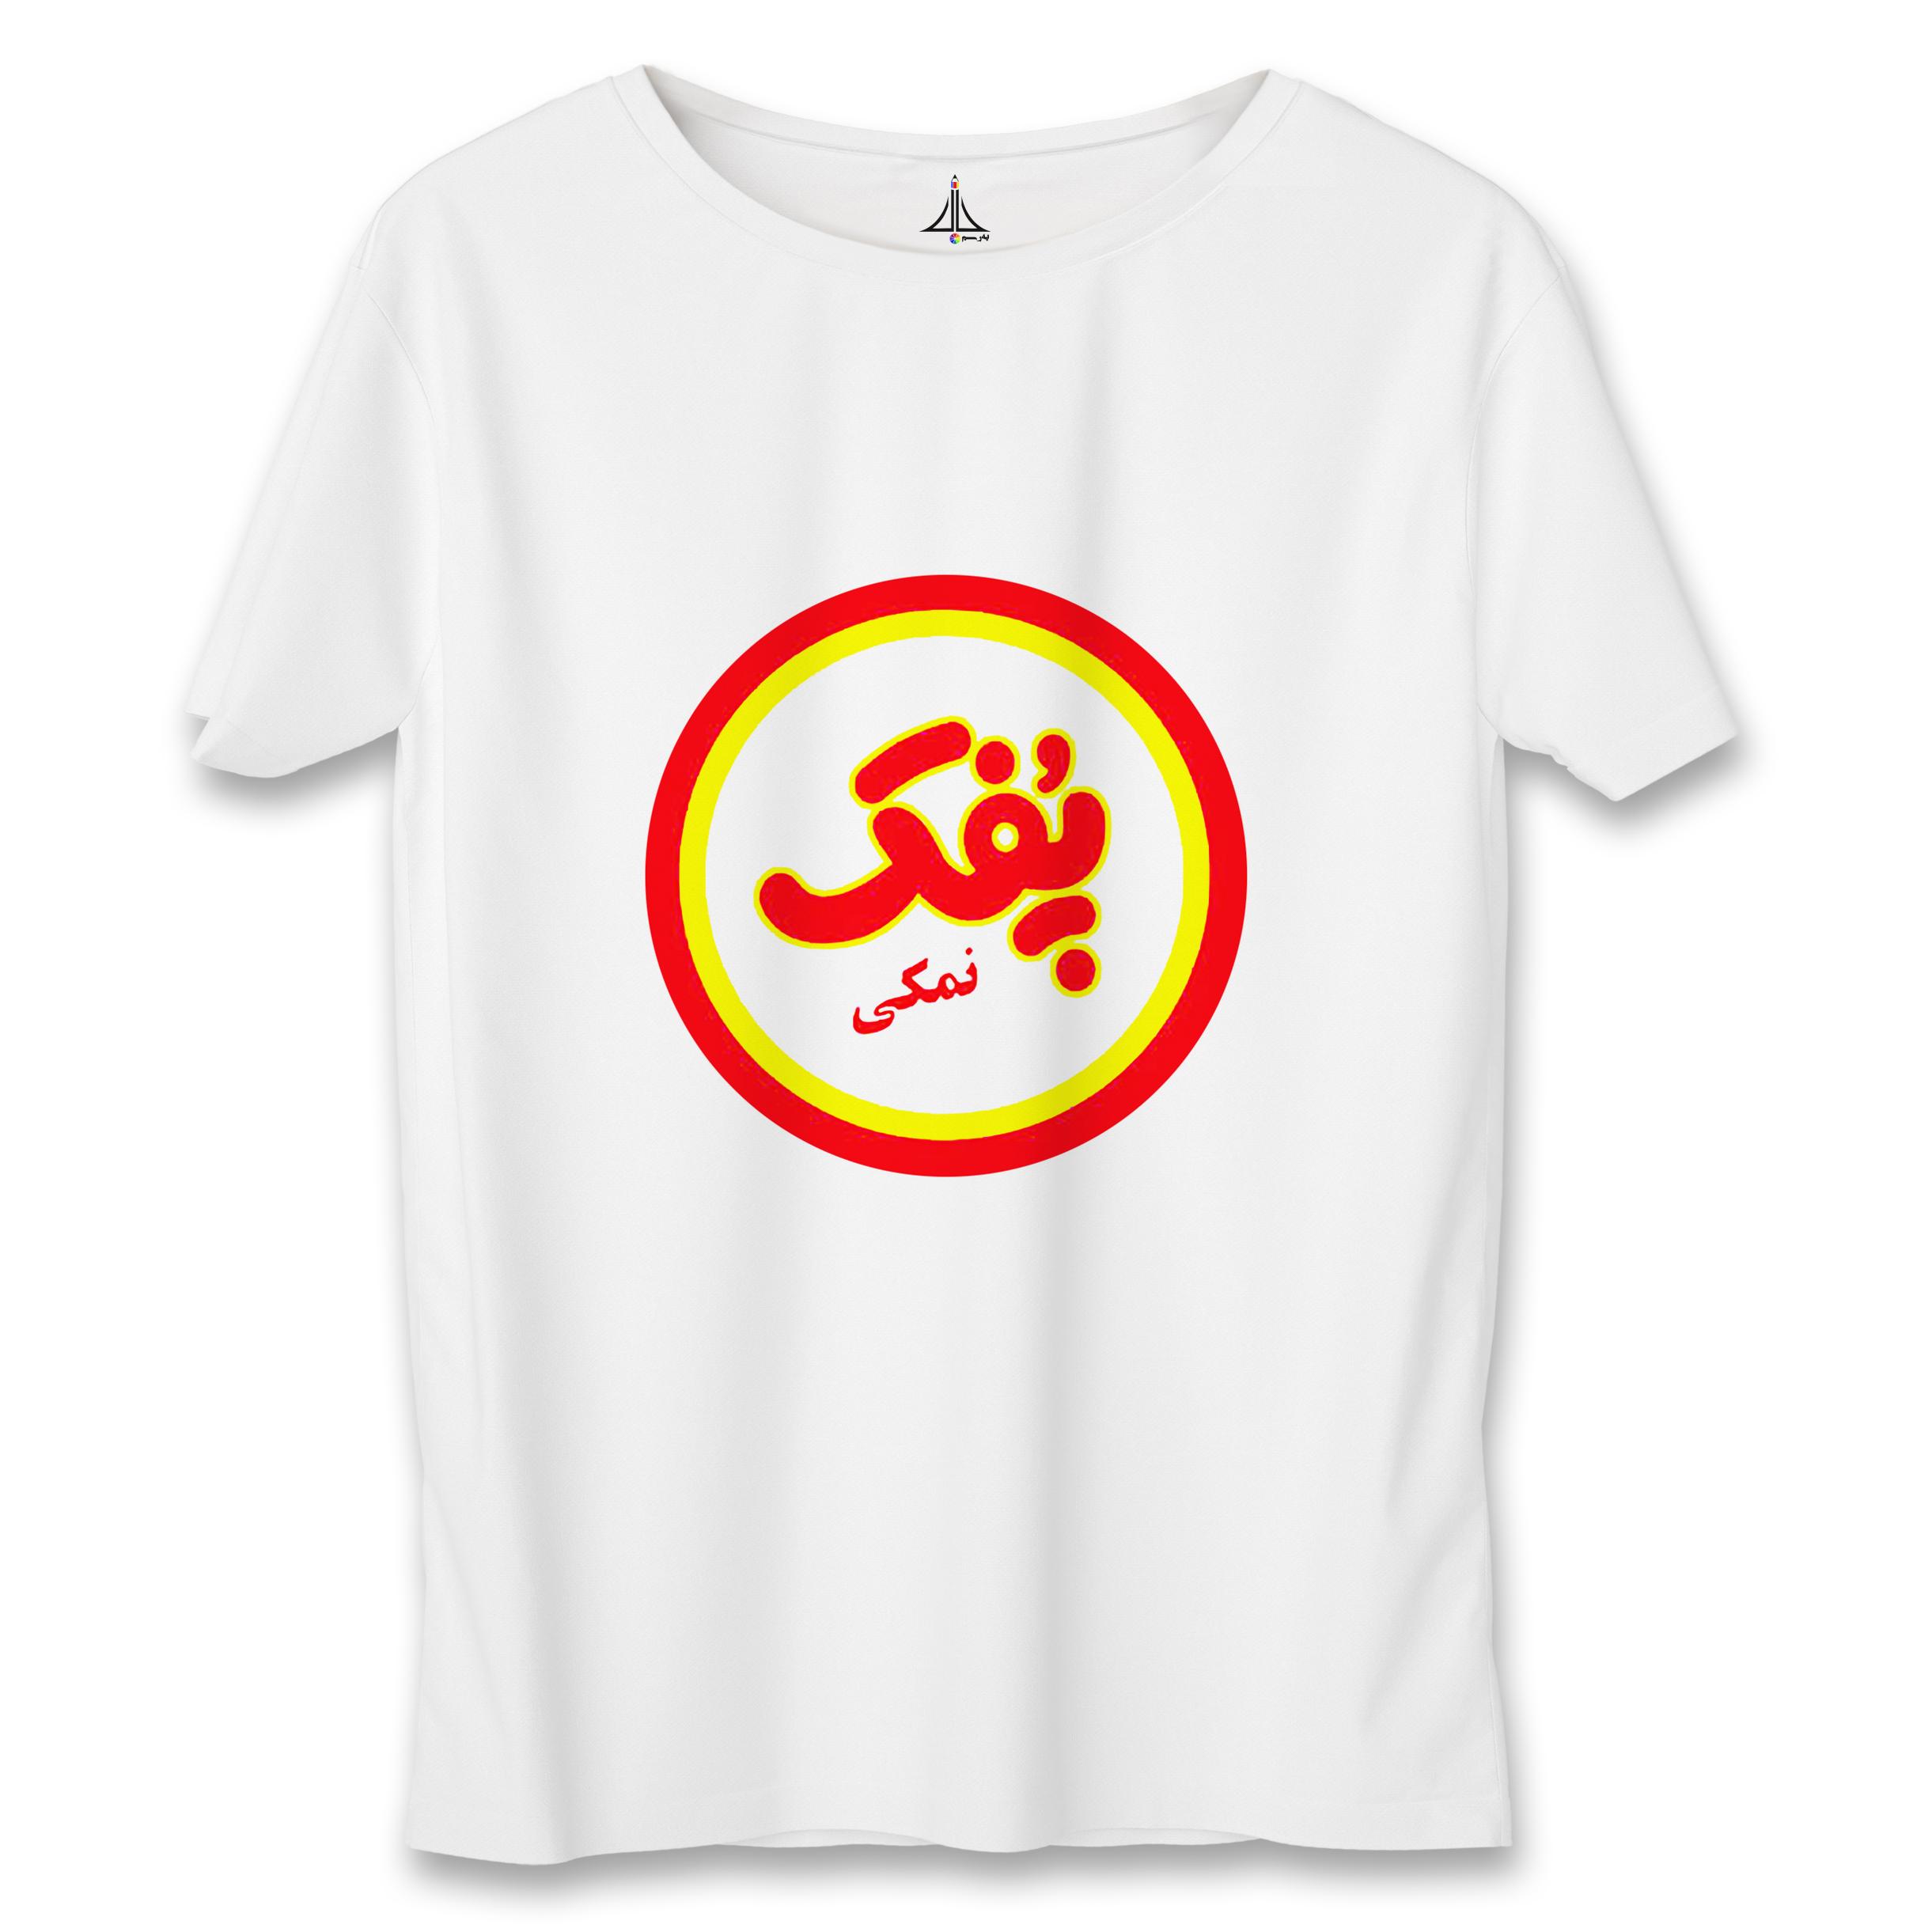 Photo of تی شرت زنانه به رسم طرح پفک نمکی کد 5569